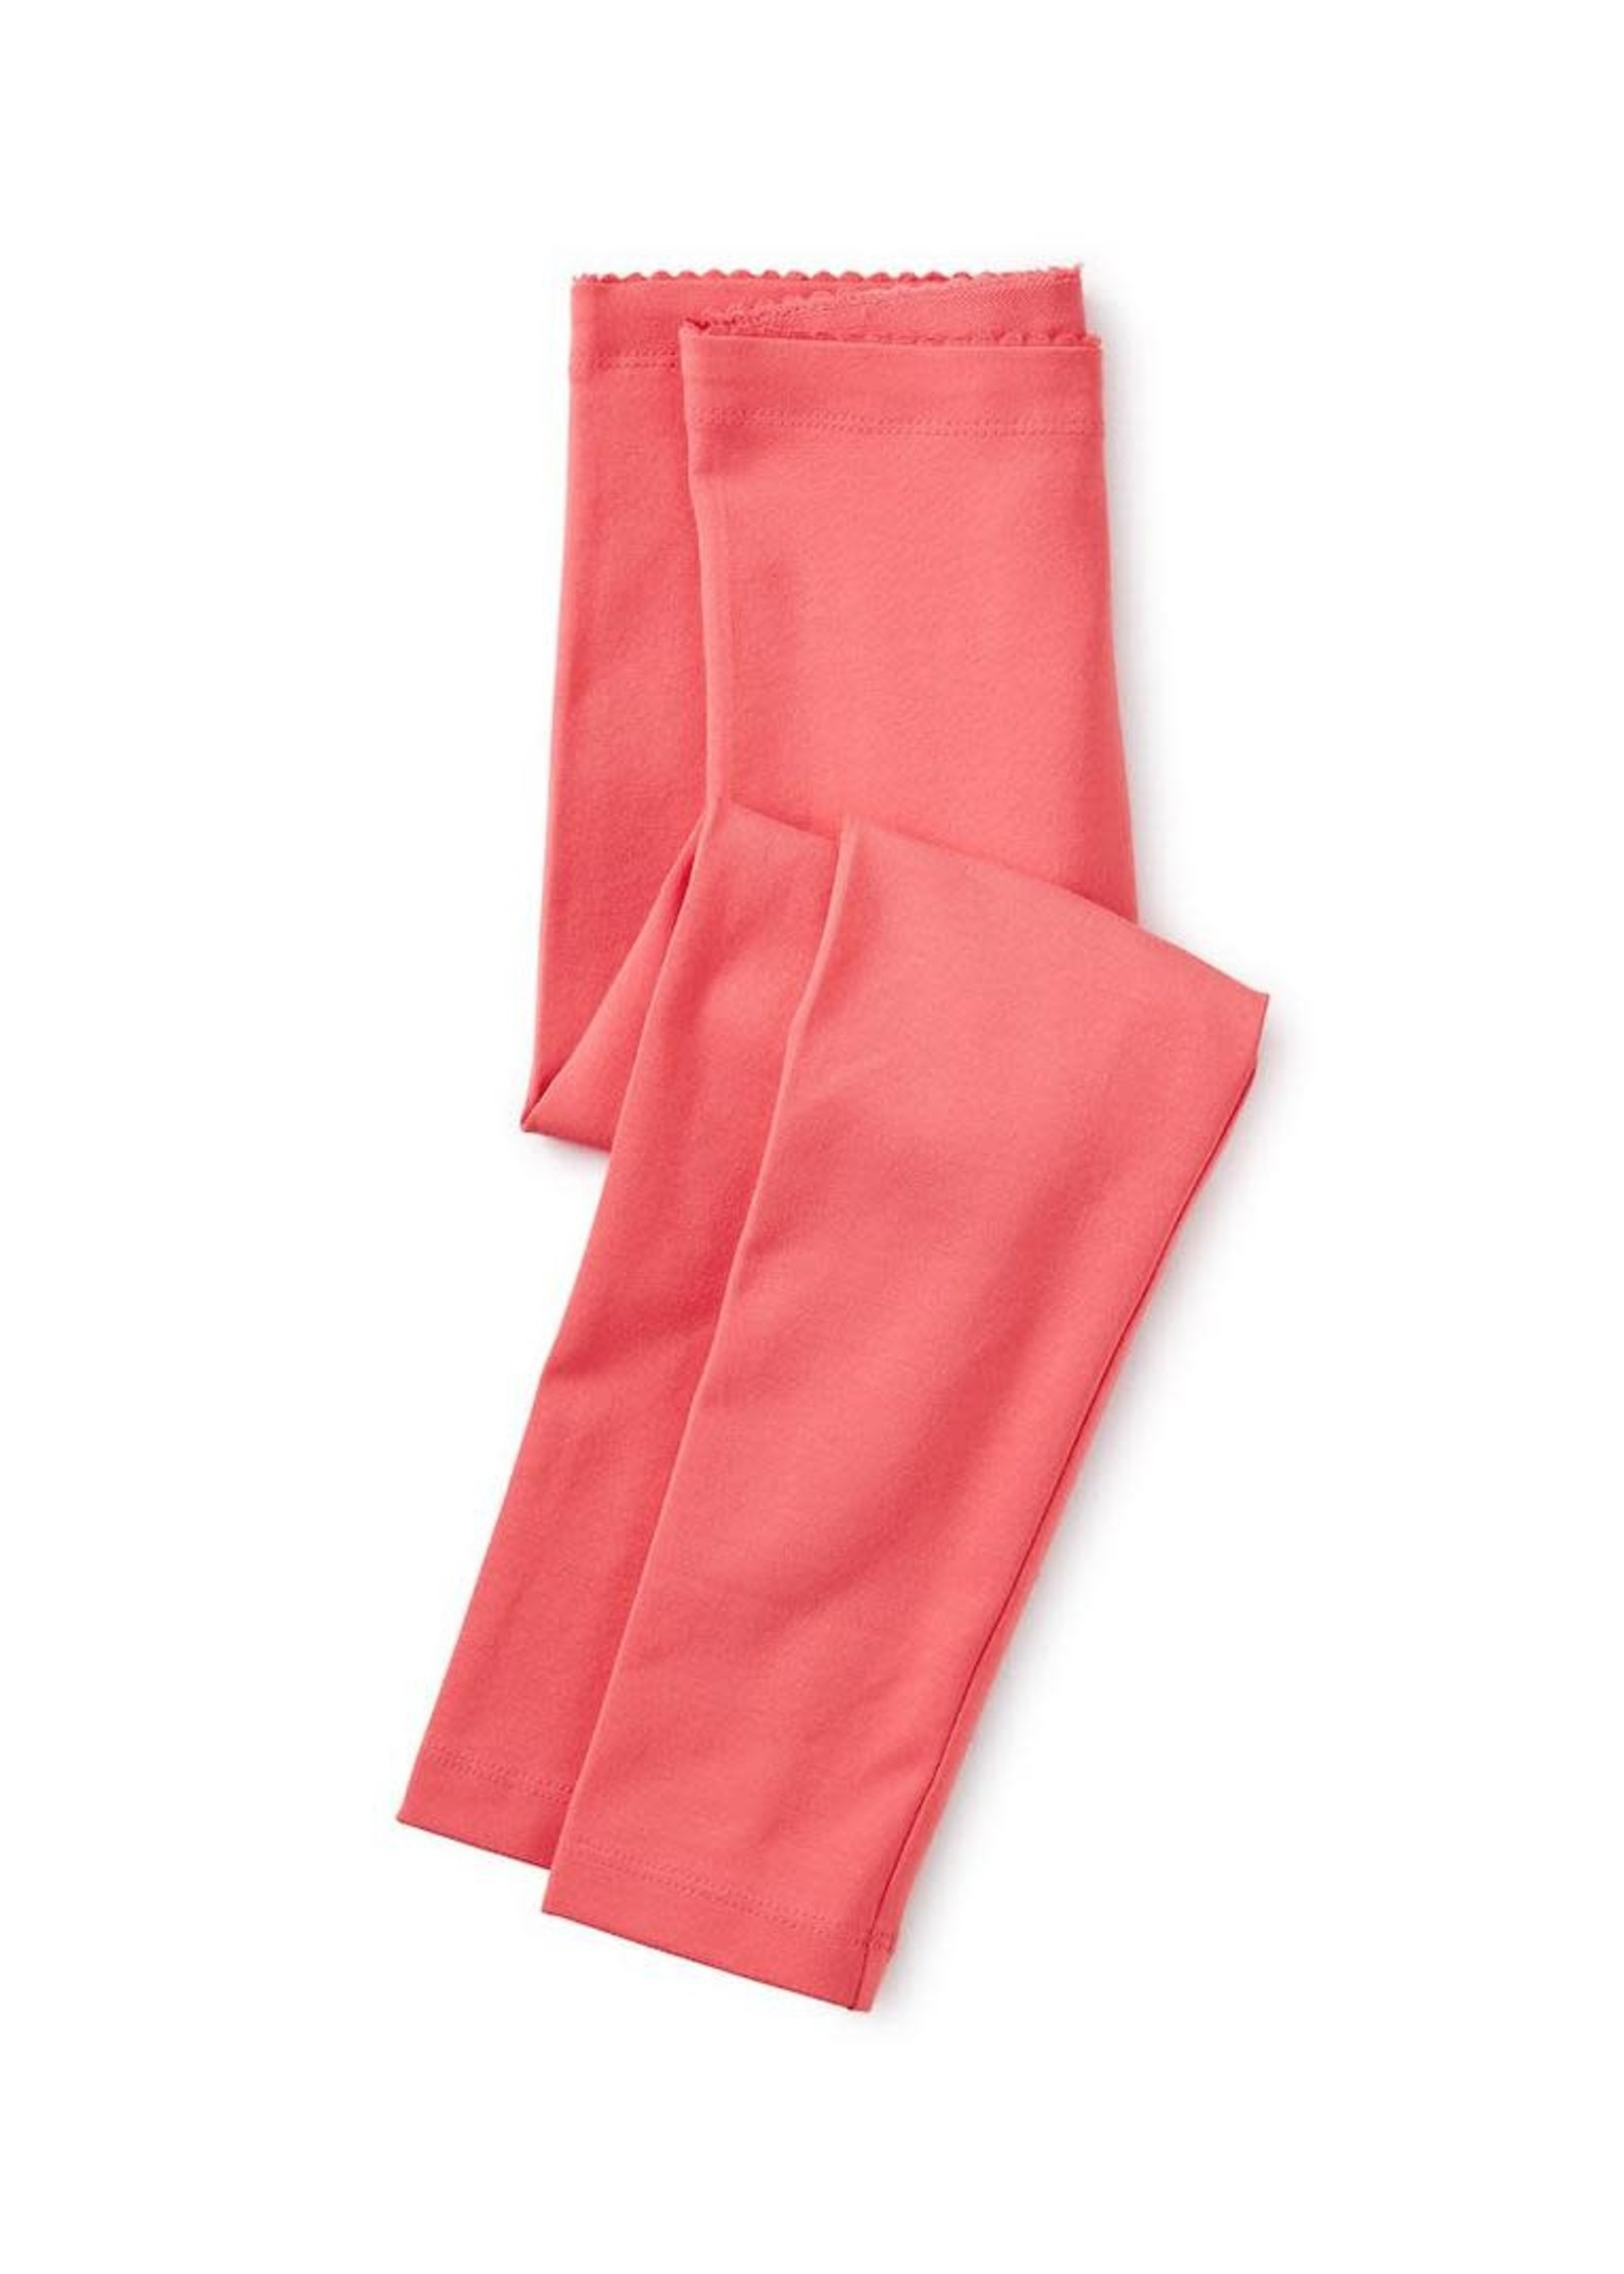 Tea Collection Tea Collection, Flat Neon Rosa Solid Leggings